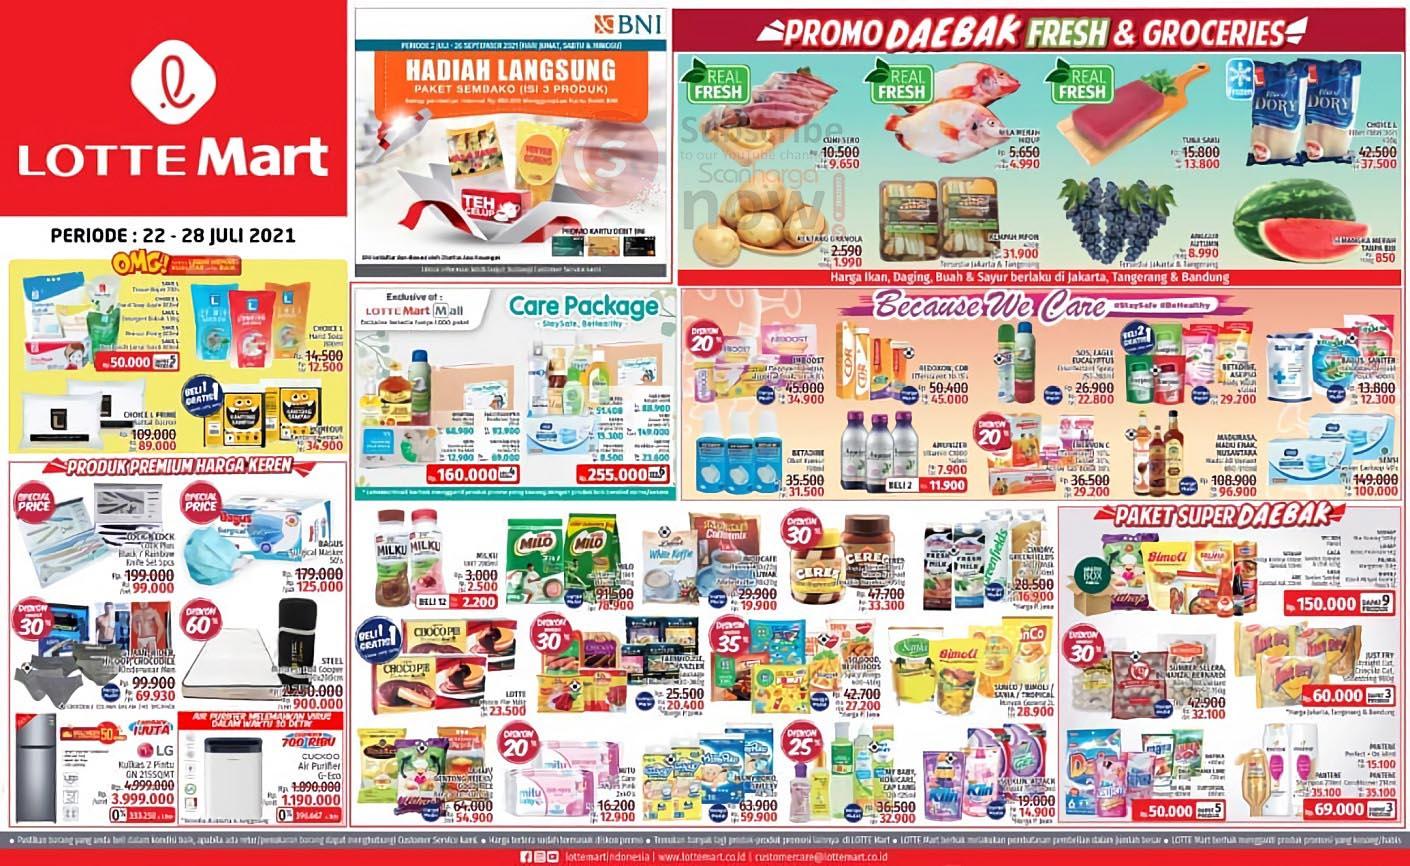 Katalog Promo JSM Lottemart Weekend 22 - 28 Juli 2021